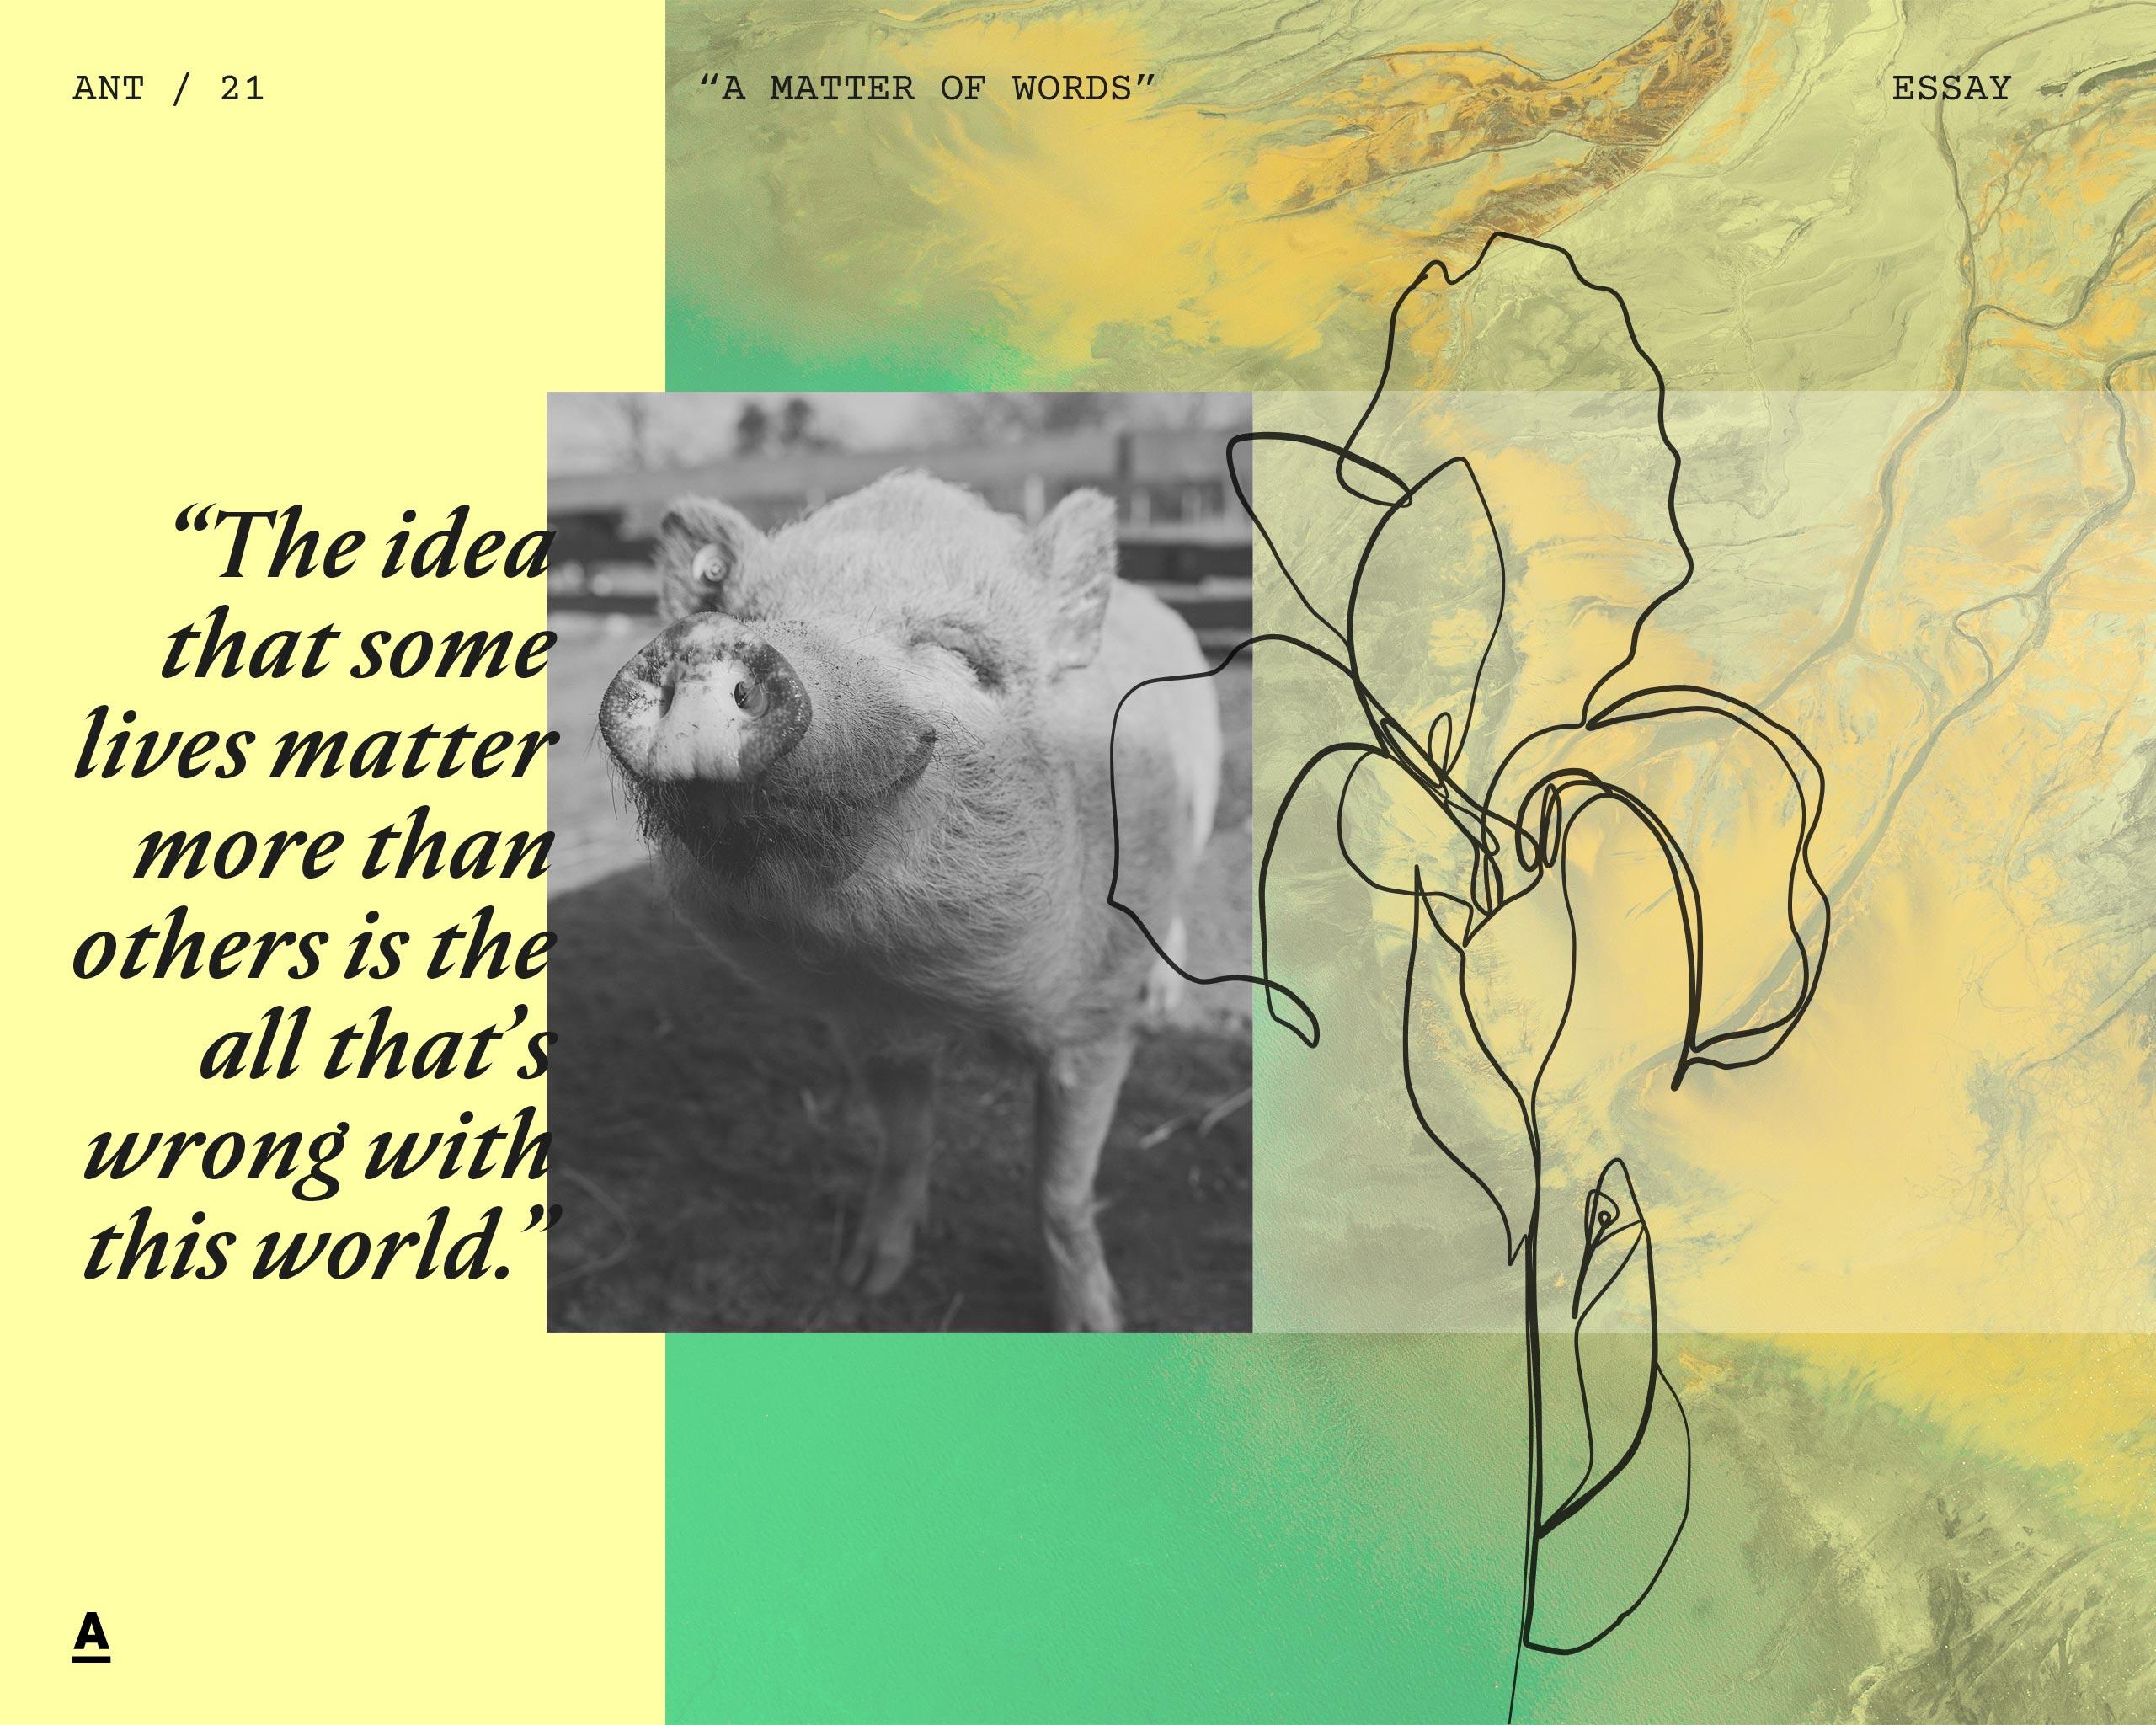 A Matter of Words – Essay - Antagonist